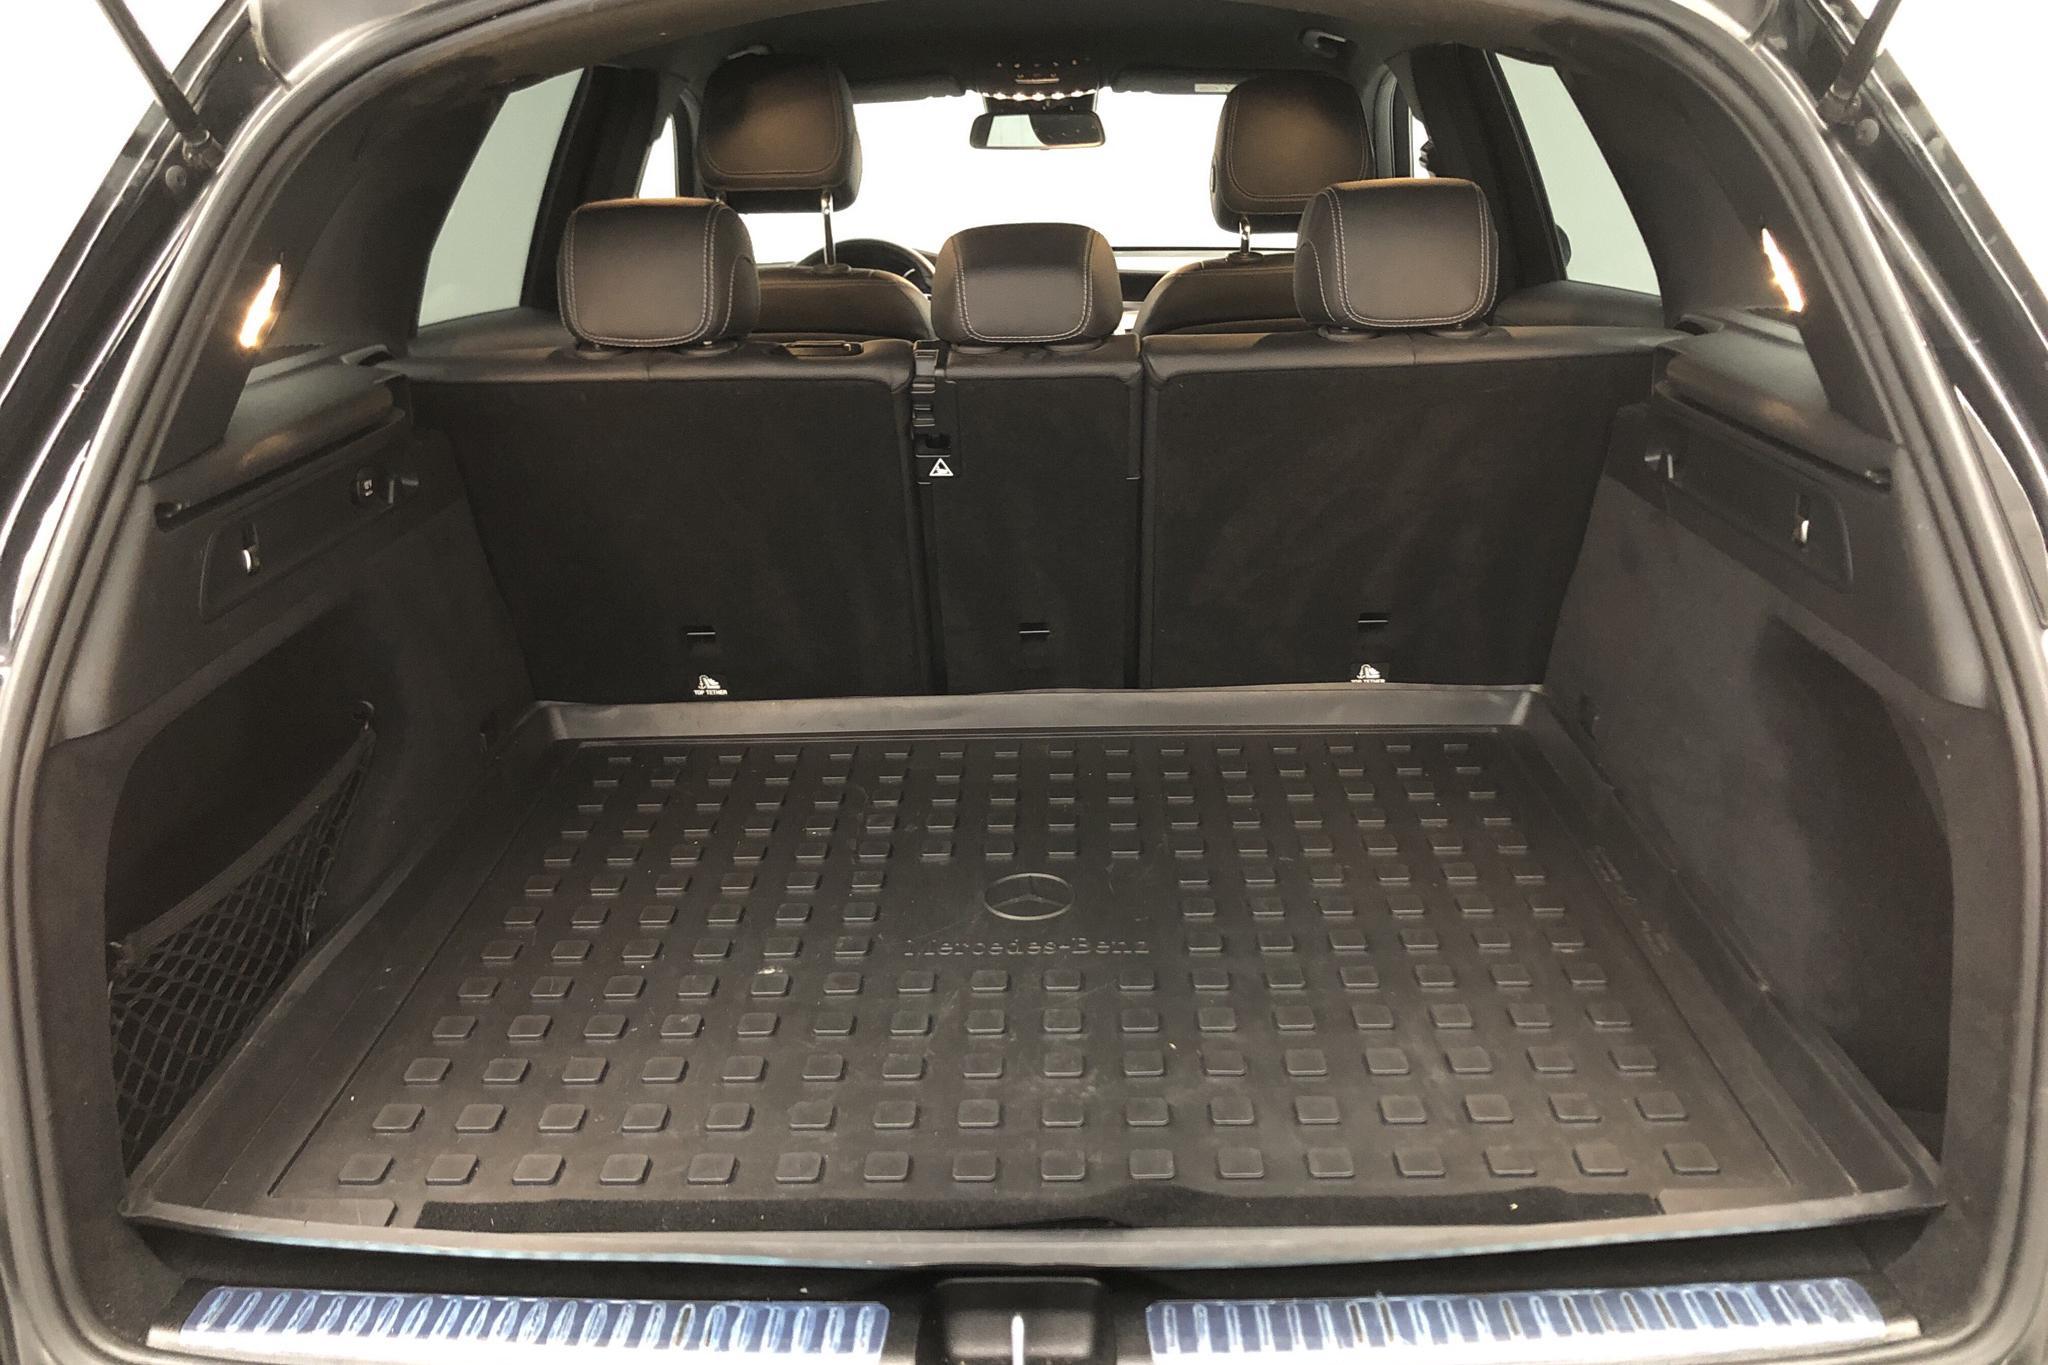 Mercedes GLC 220 d 4MATIC X253 (170hk) - 77 800 km - Automatic - black - 2018